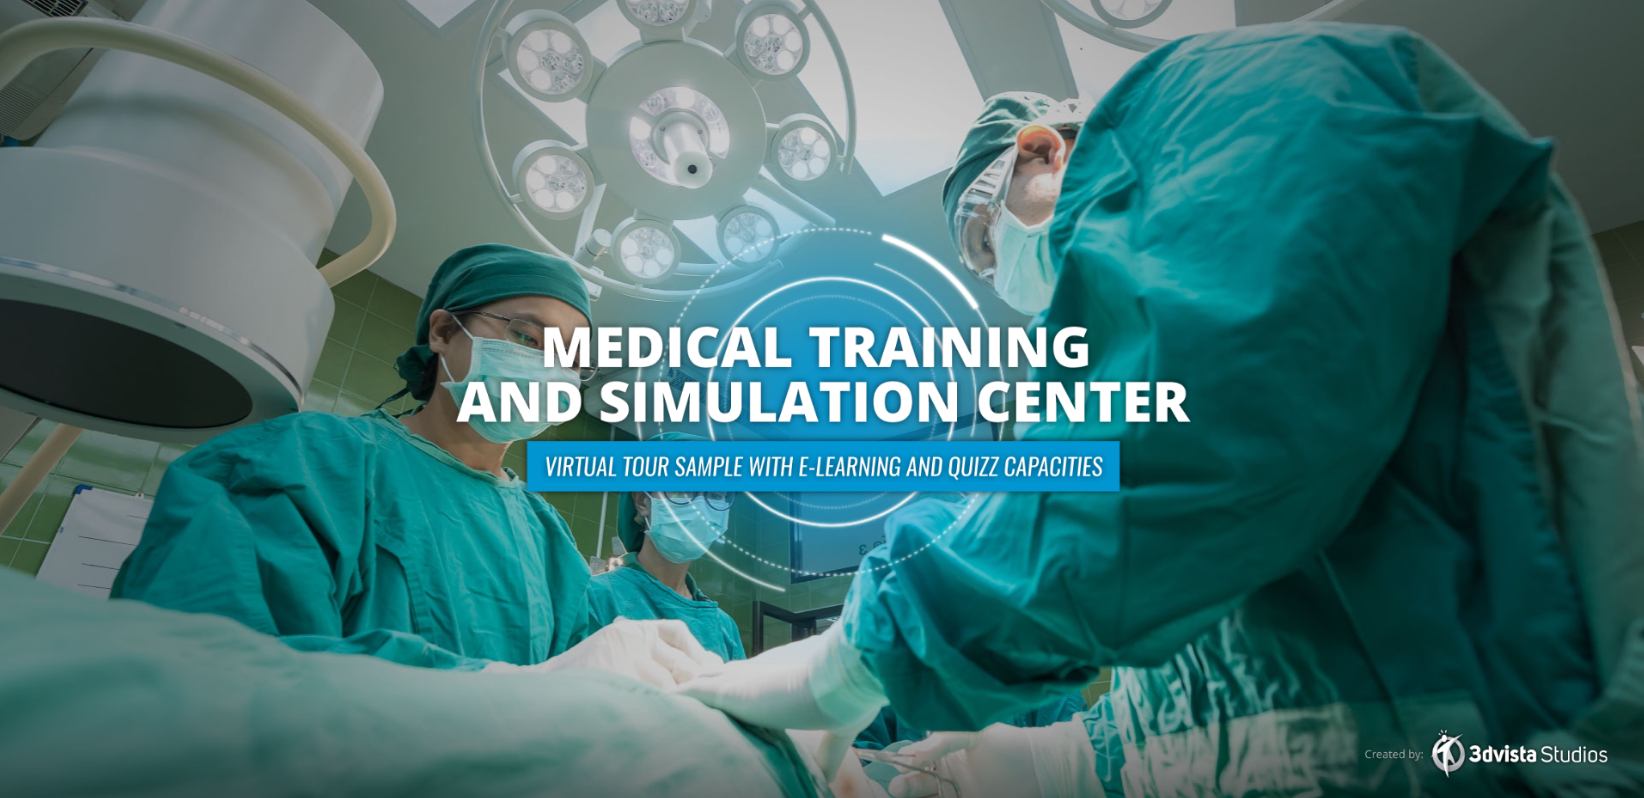 Tours Virtuales en E-Learning, Trainings y Exámenes